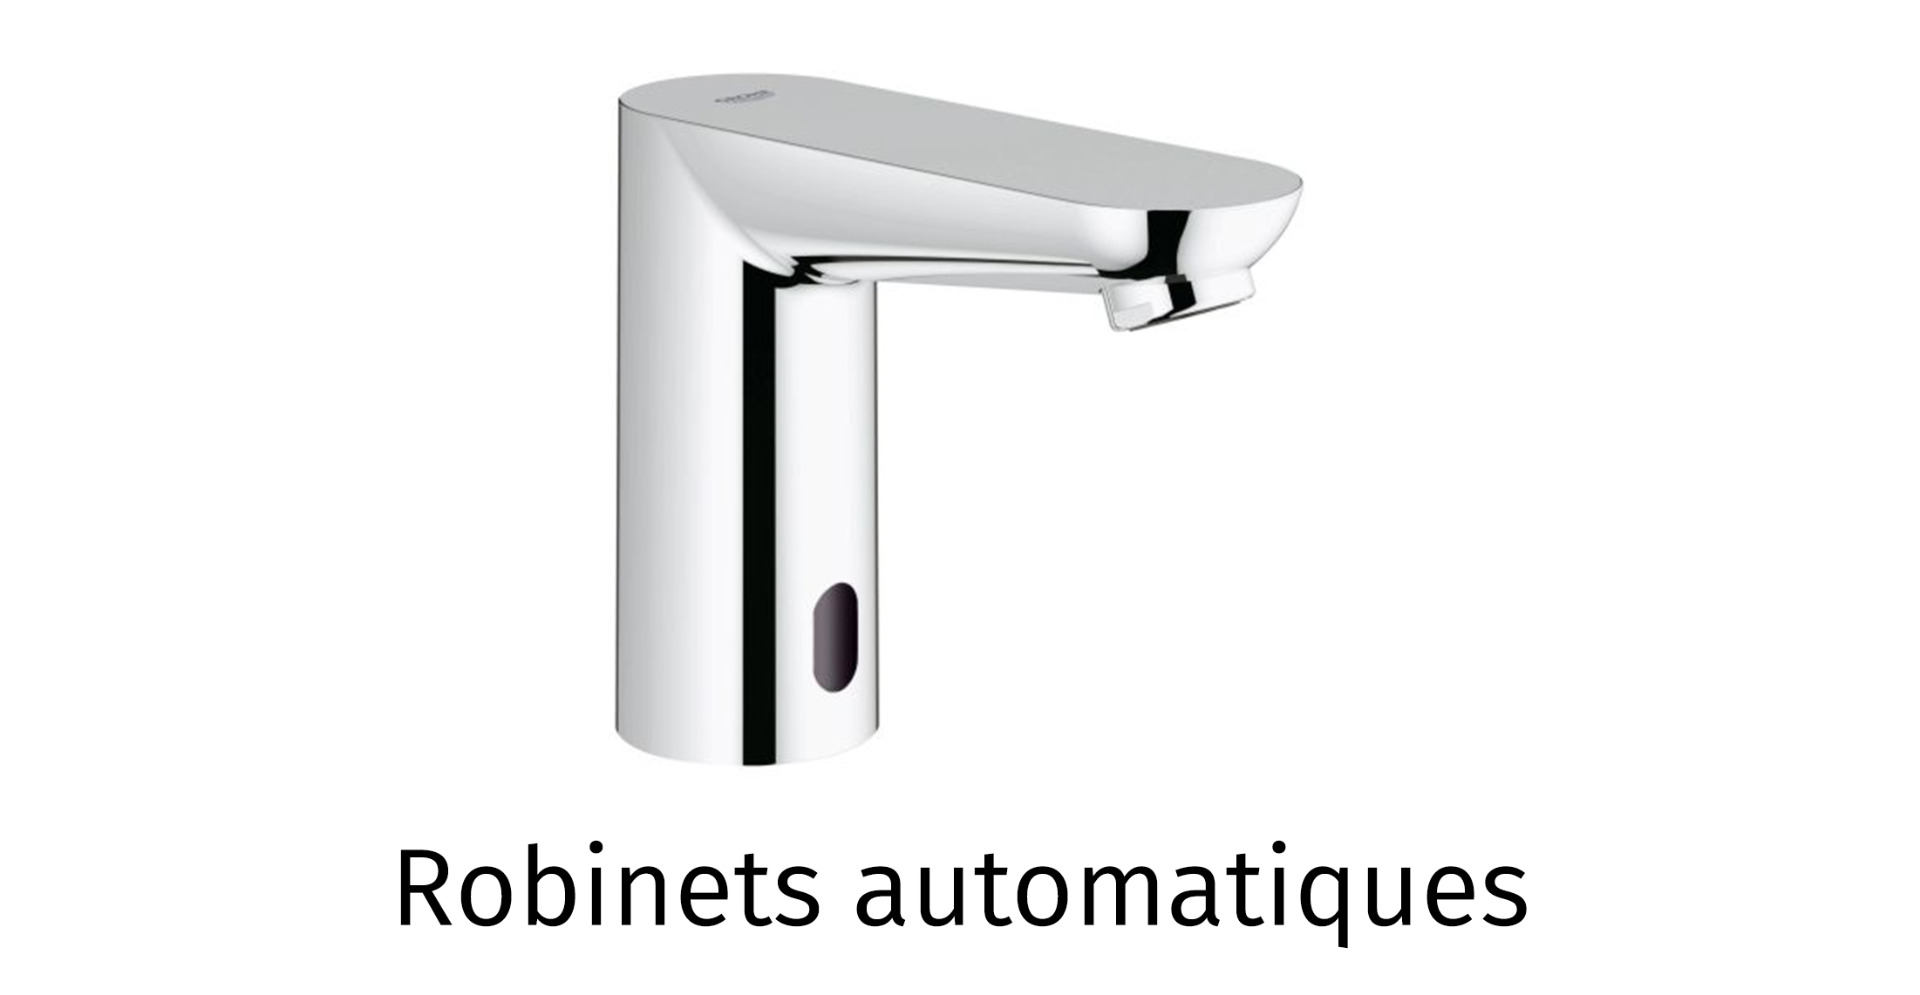 Robinets automatiques